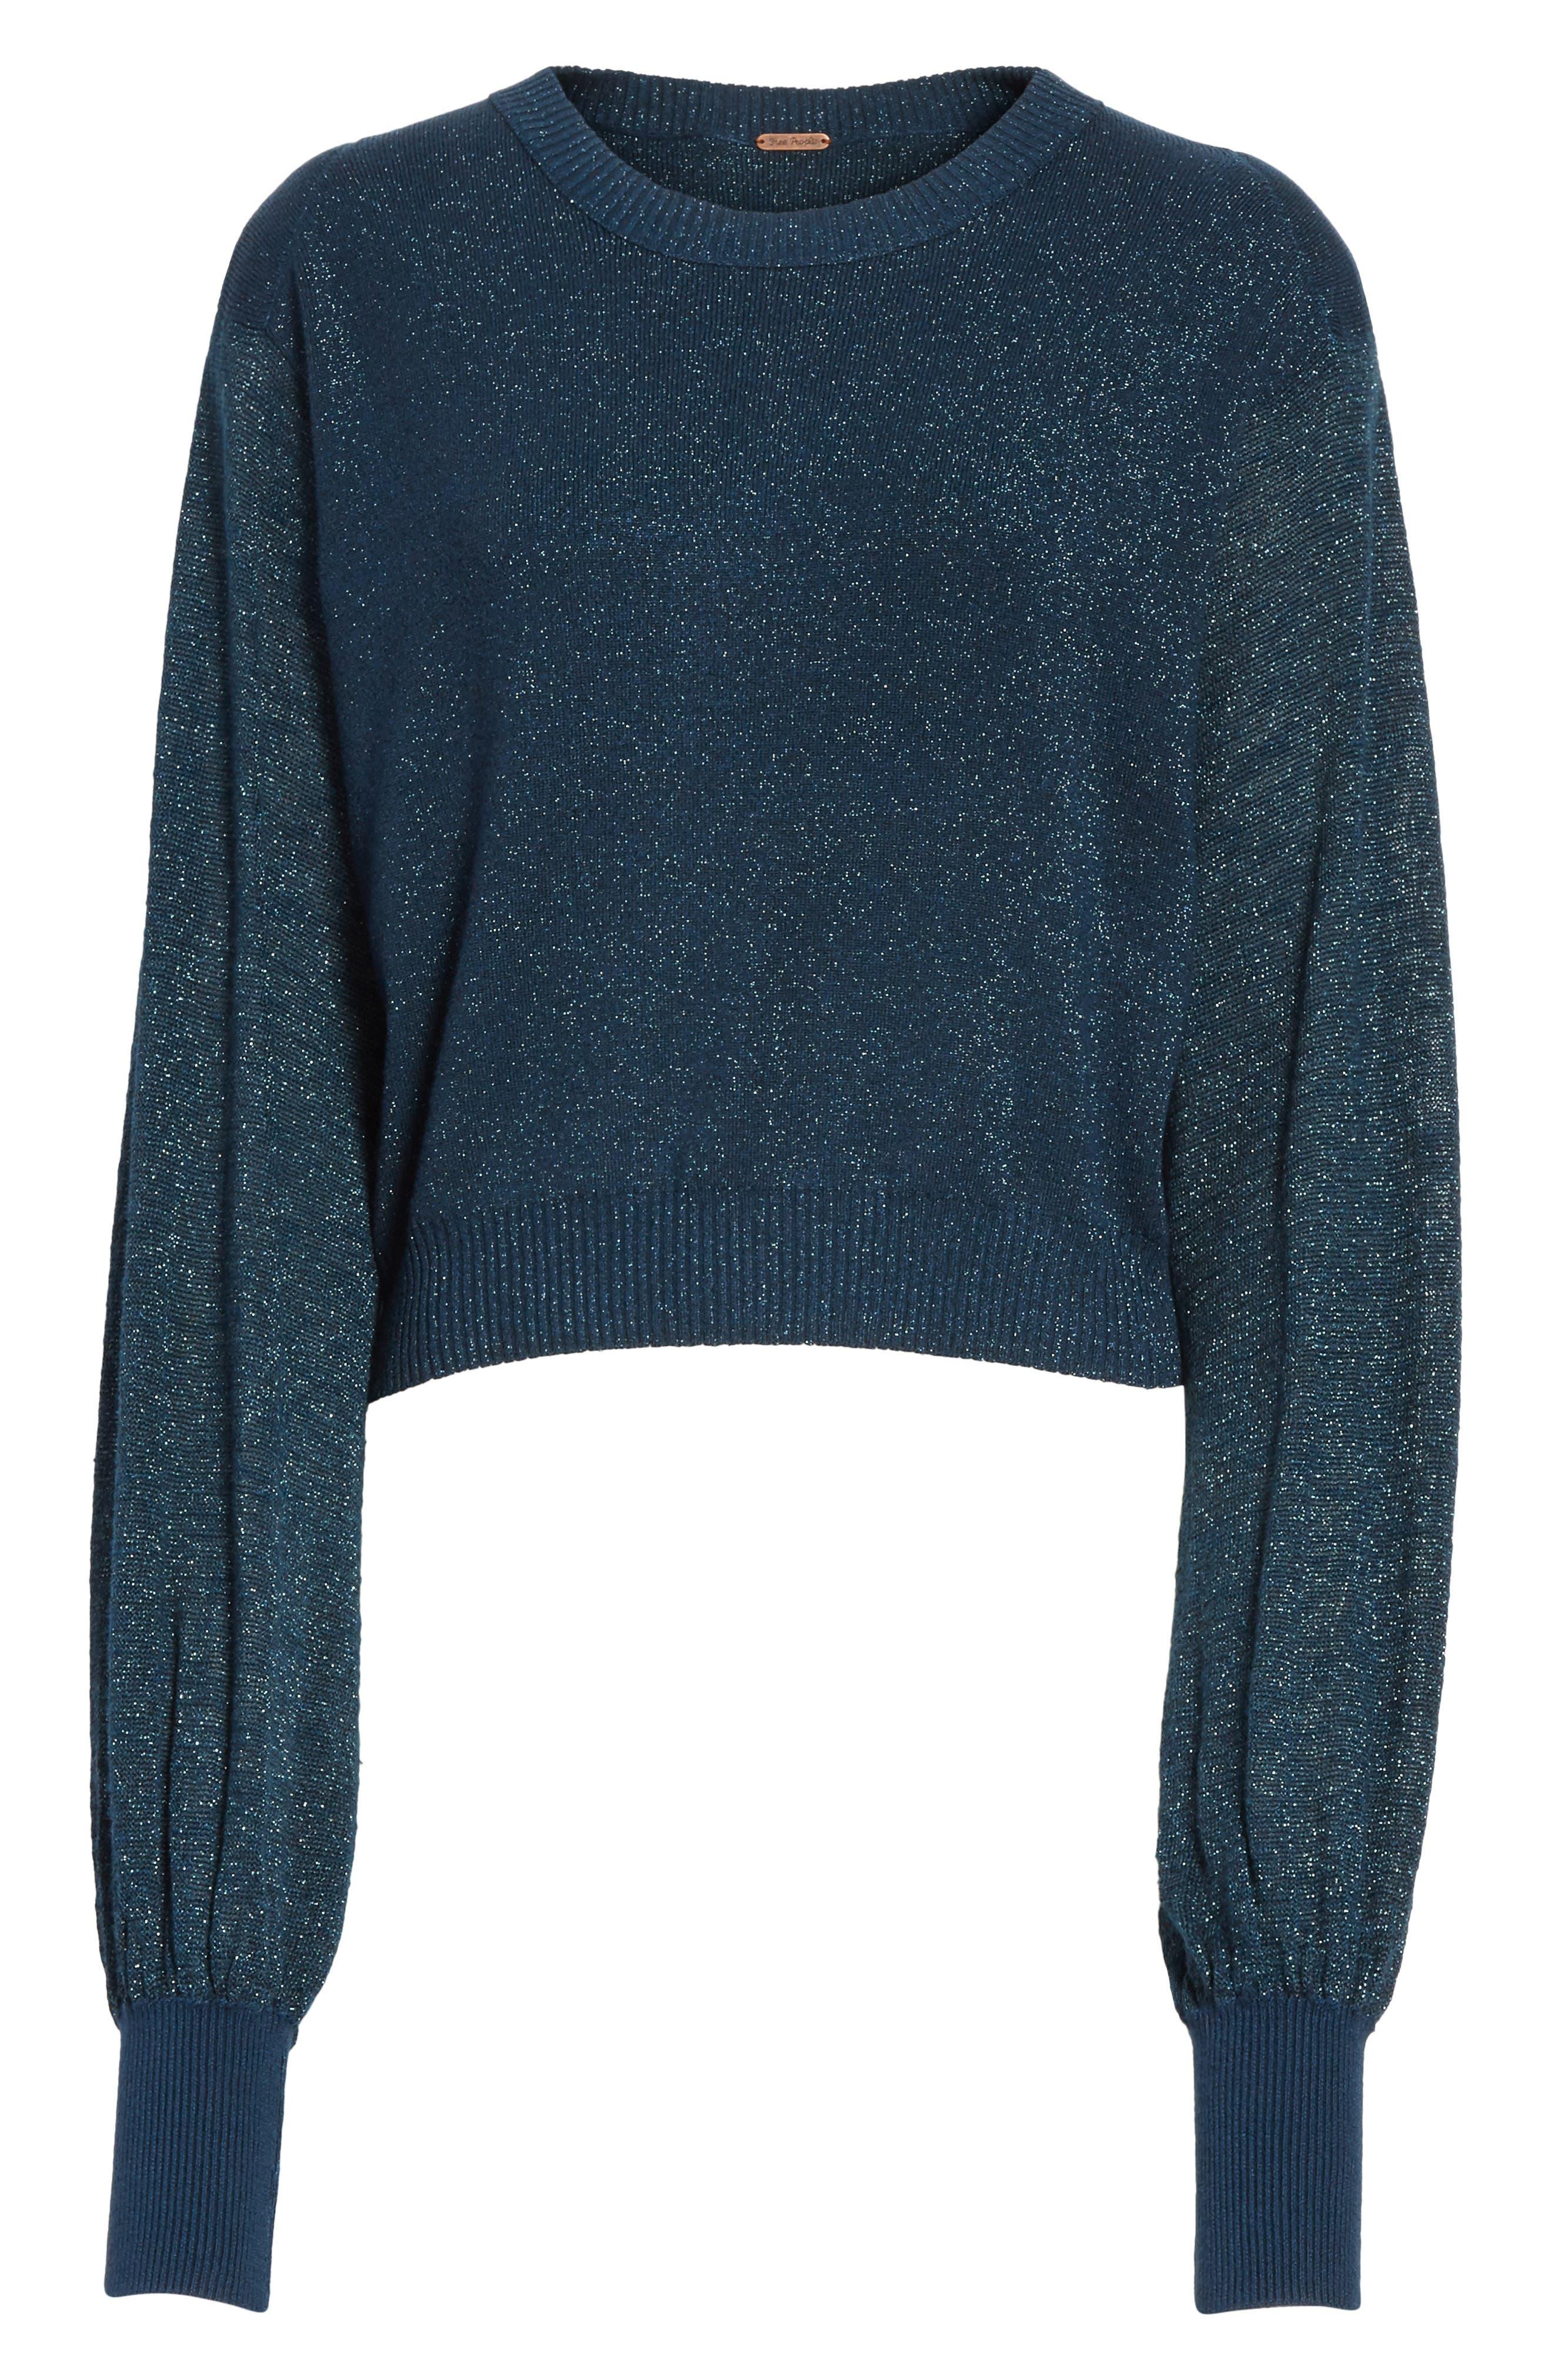 Let it Shine Sweater,                             Alternate thumbnail 6, color,                             Navy